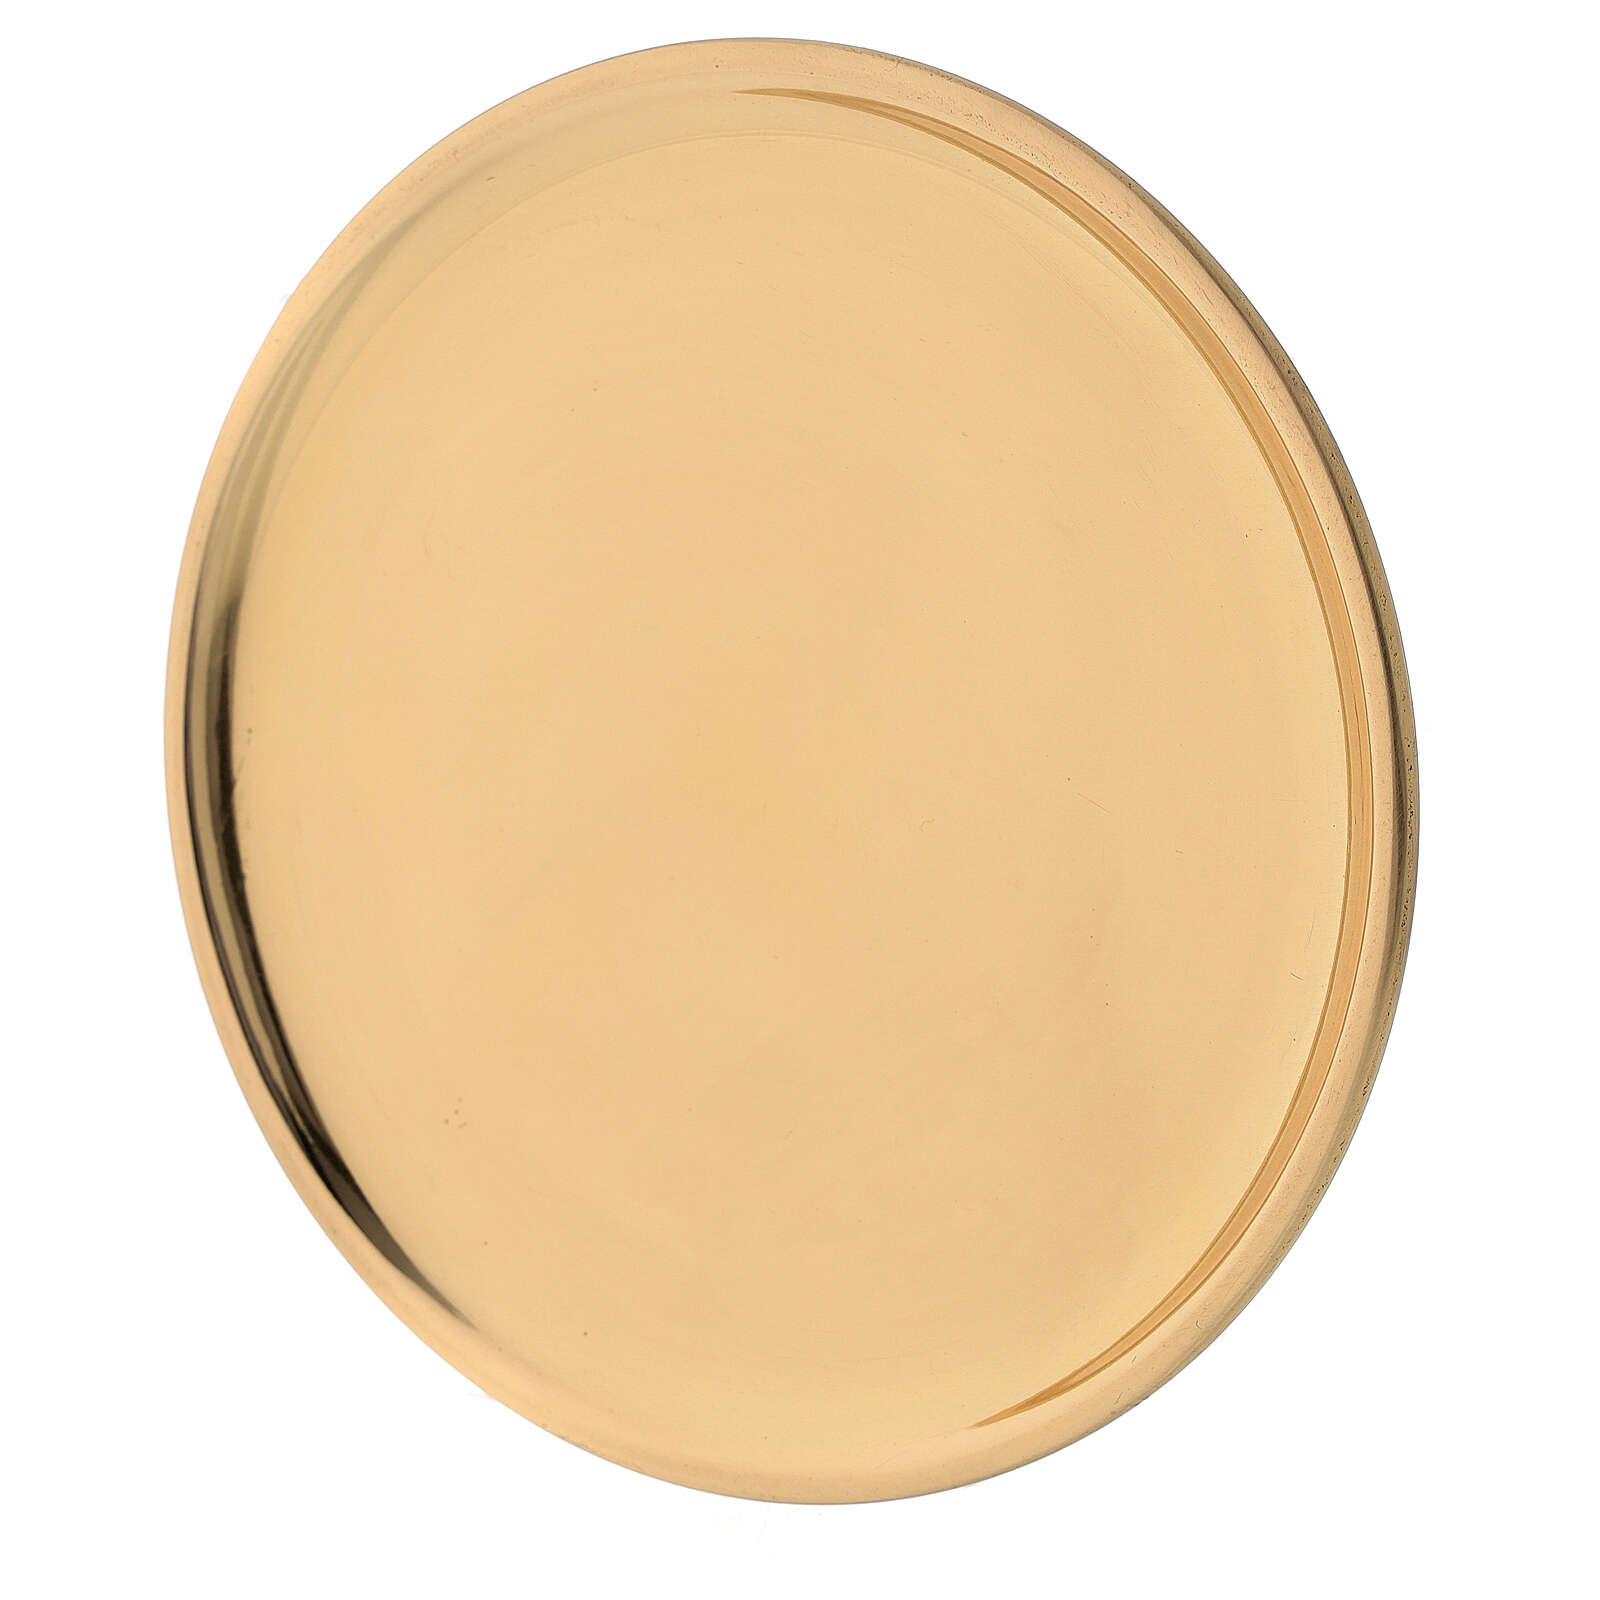 Plato latón dorado lúcido velas diámetro 12 cm 3